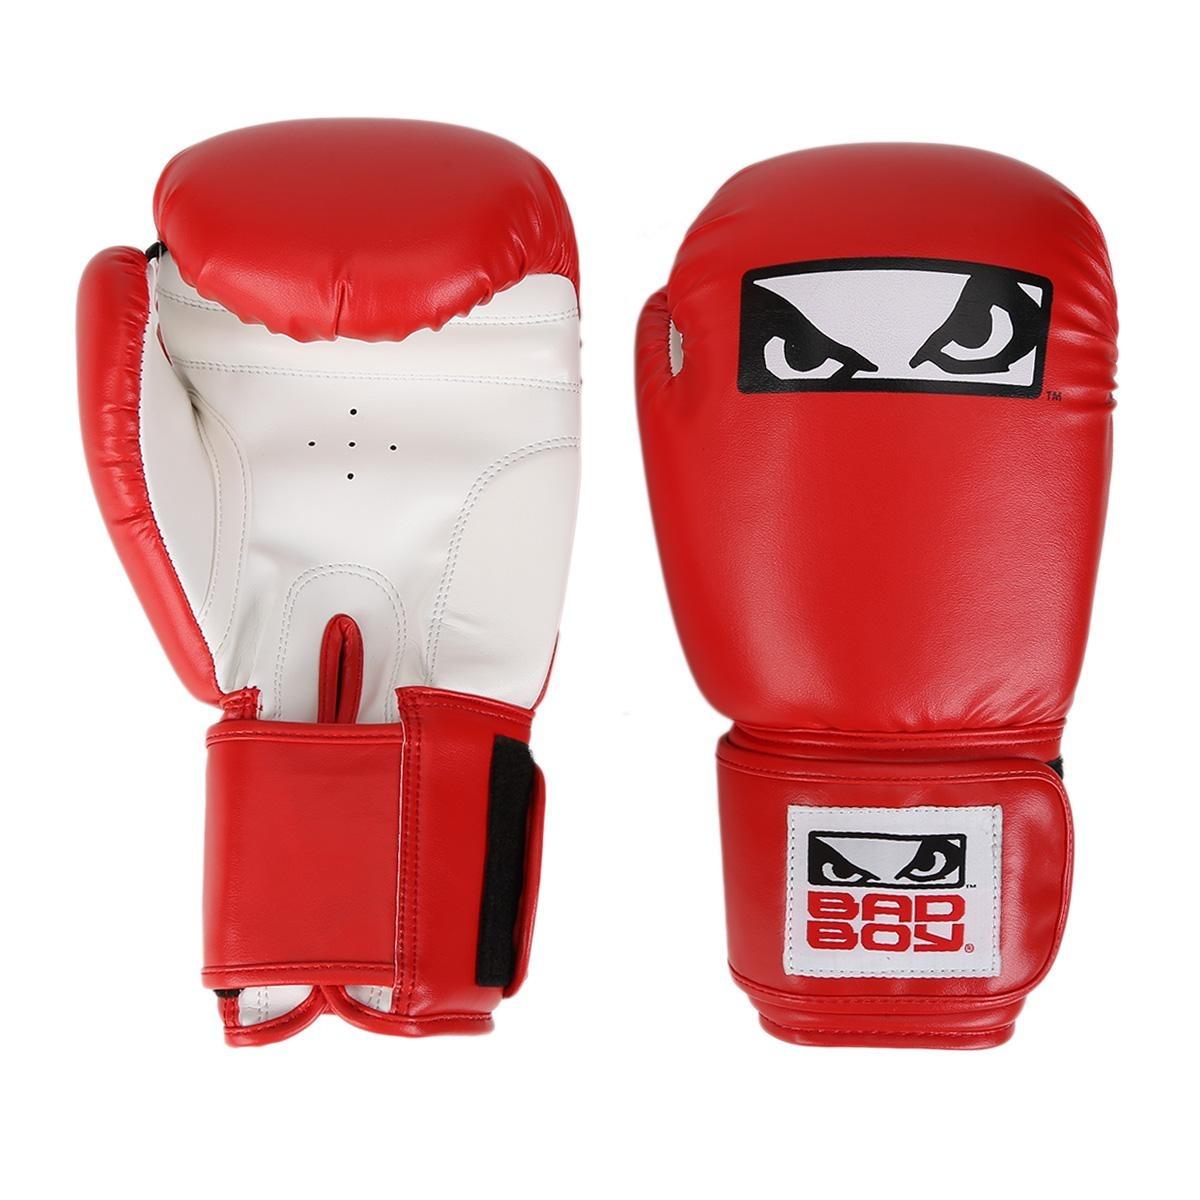 9cb1bd35e luva de boxe muay thai treino bad boy 16 oz. Carregando zoom.